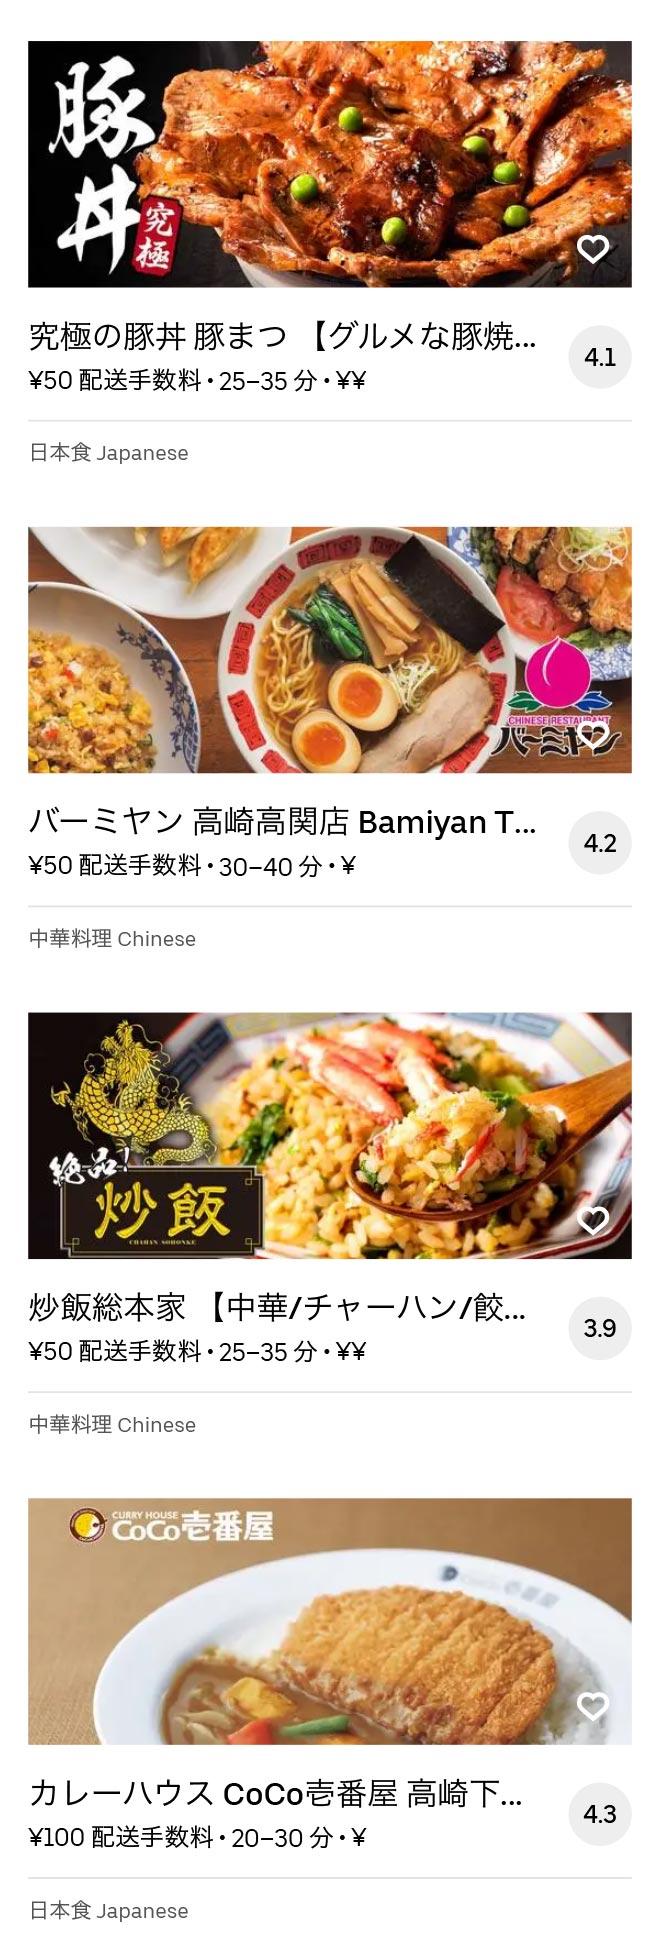 Takasaki menu 2010 07